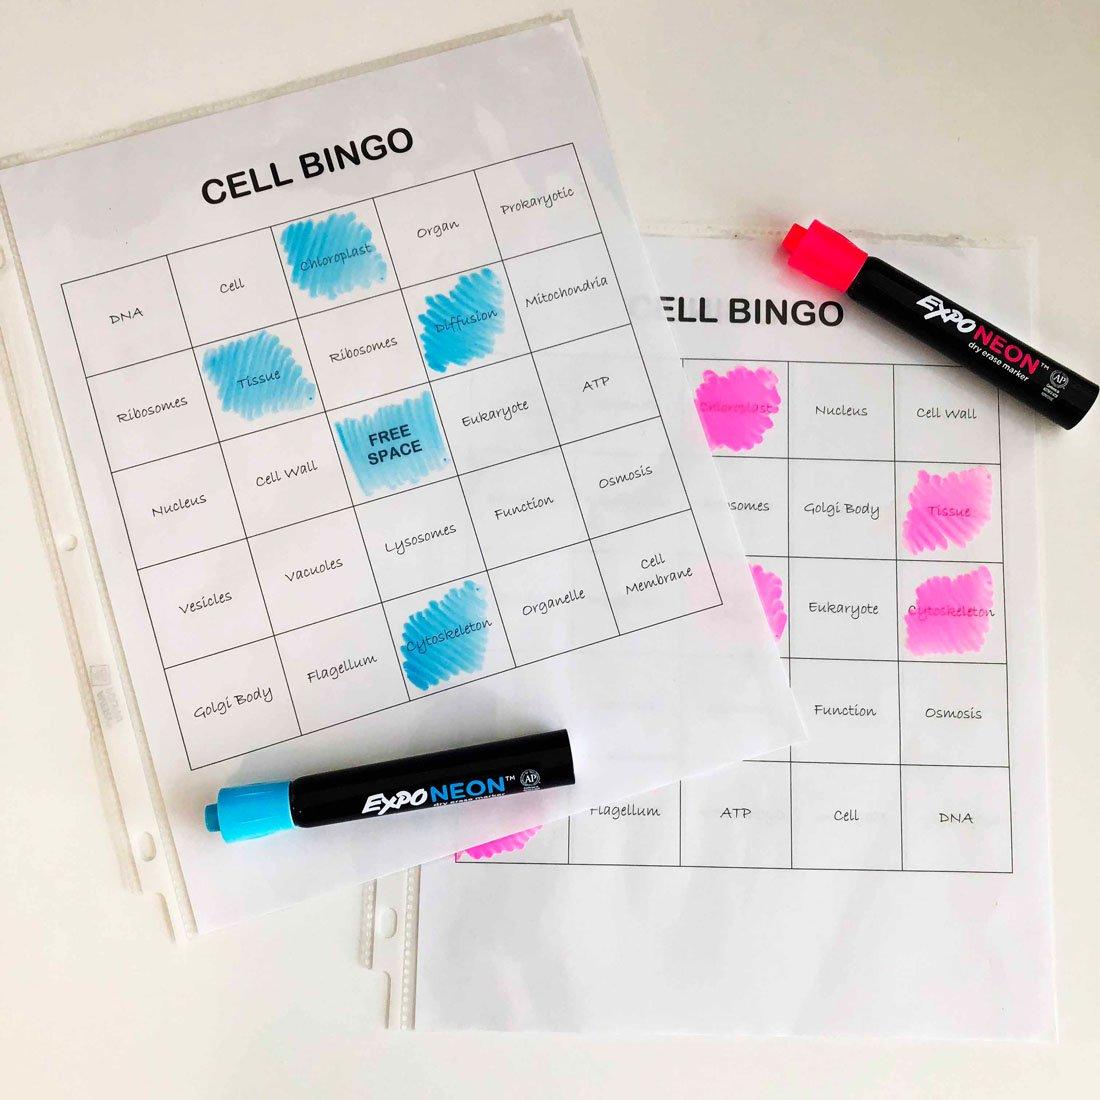 bingo-with-expo-neon-markers